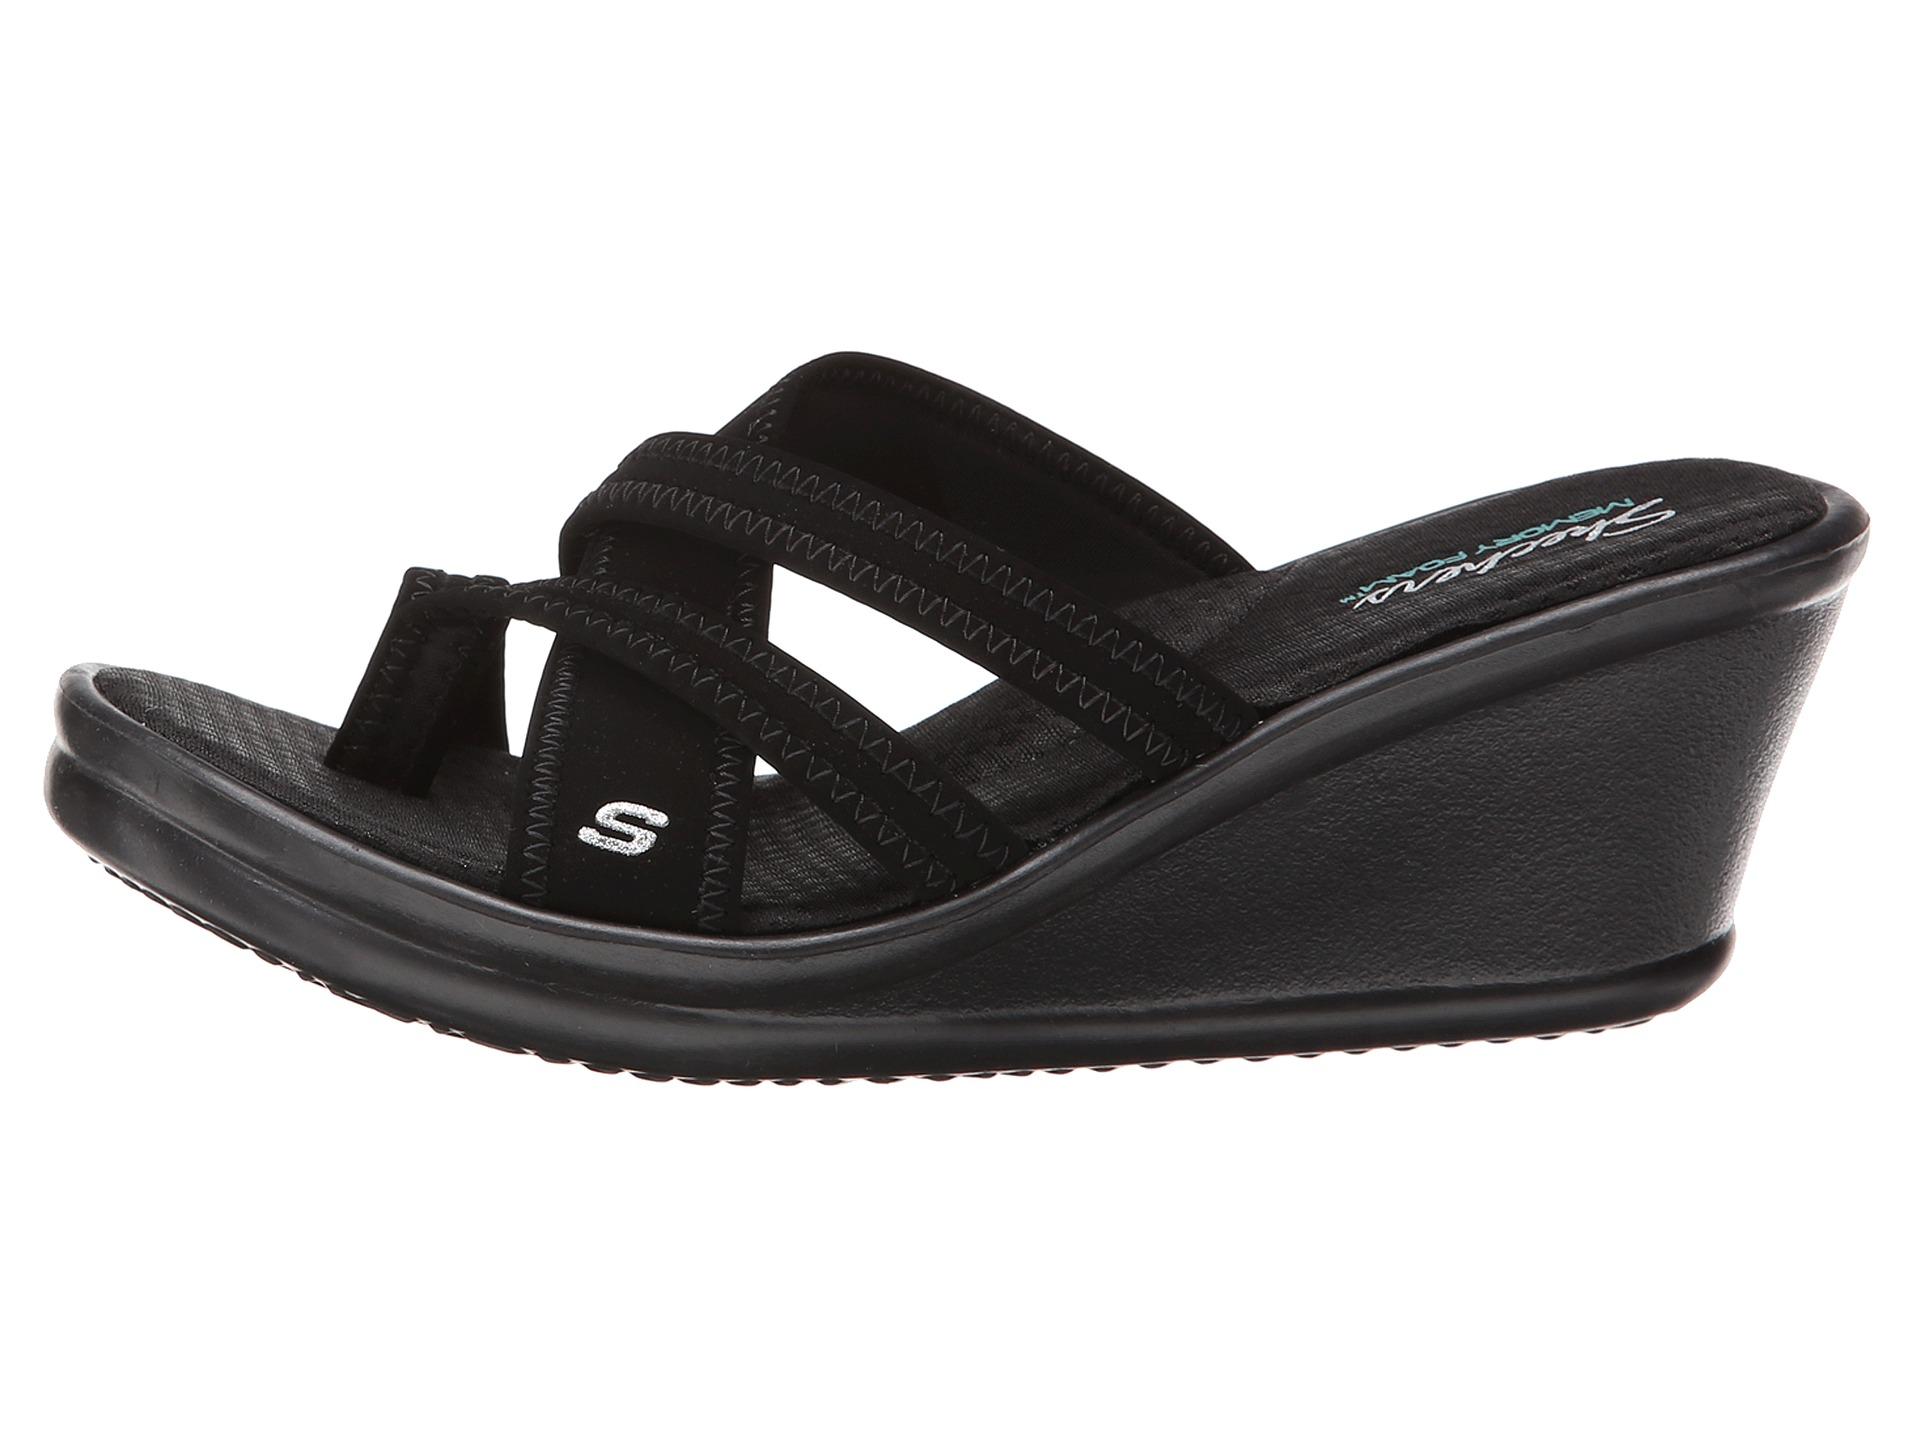 041f72bd5b8e Buy black sketcher sandals   OFF58% Discounted